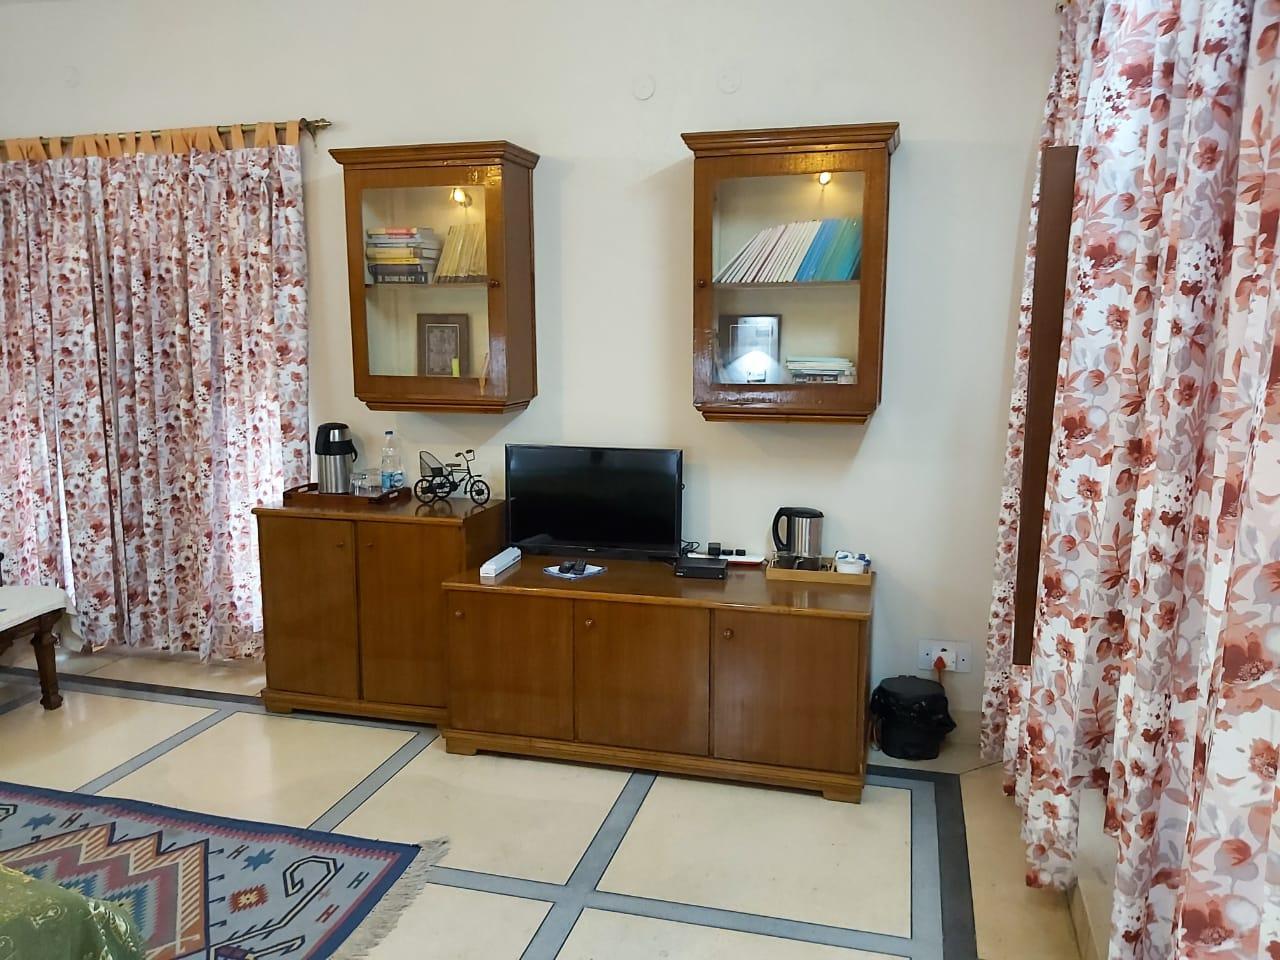 https://www.ogabnb.com/images/hotels/pd06a1qijxfbkc067rno.jpeg